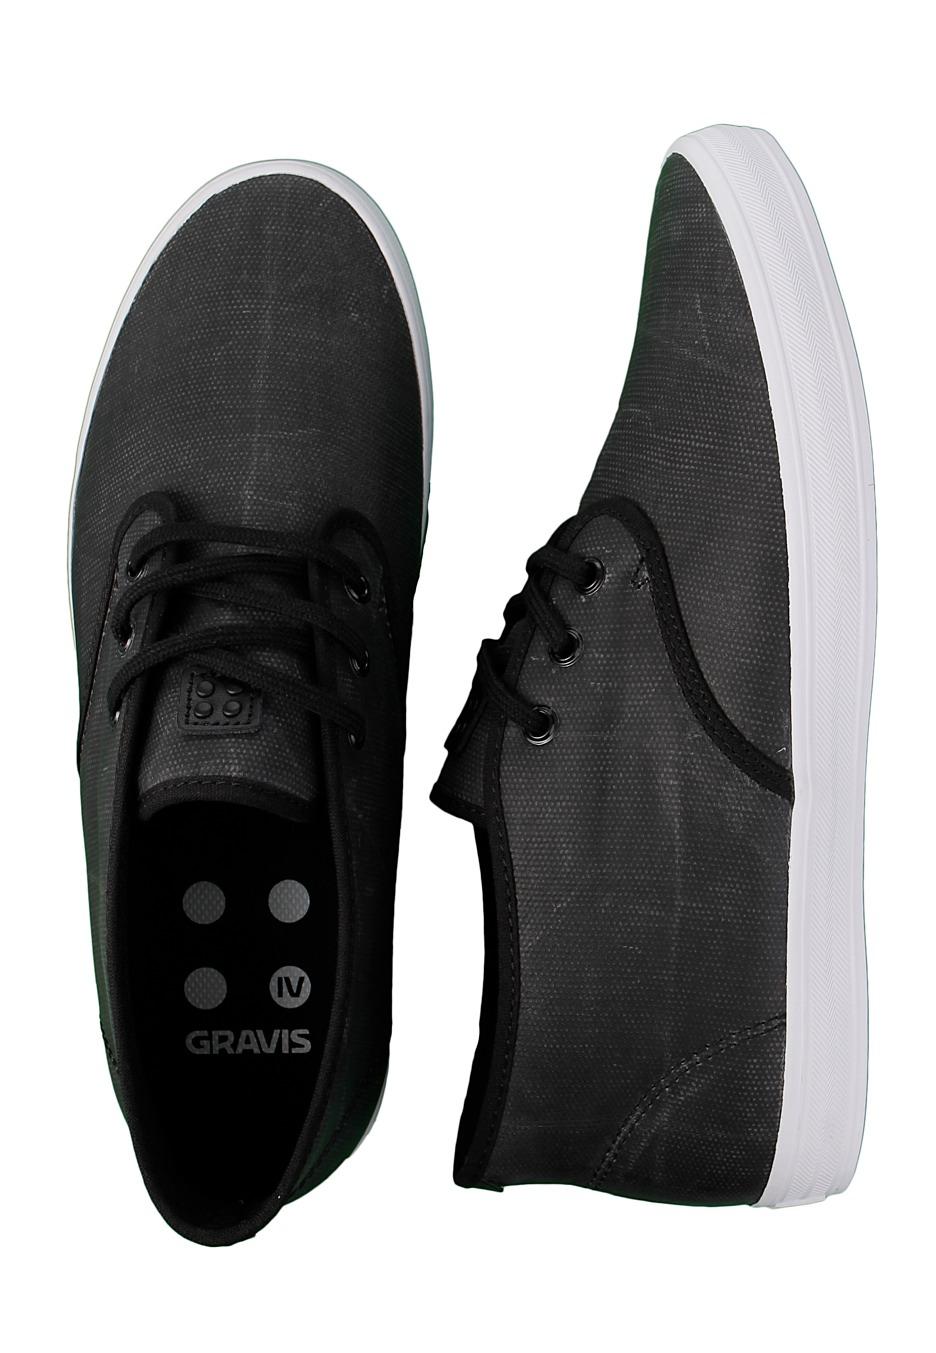 0c14ddae6a8 Gravis - Quarters LX Black Wax - Shoes - Impericon.com AU